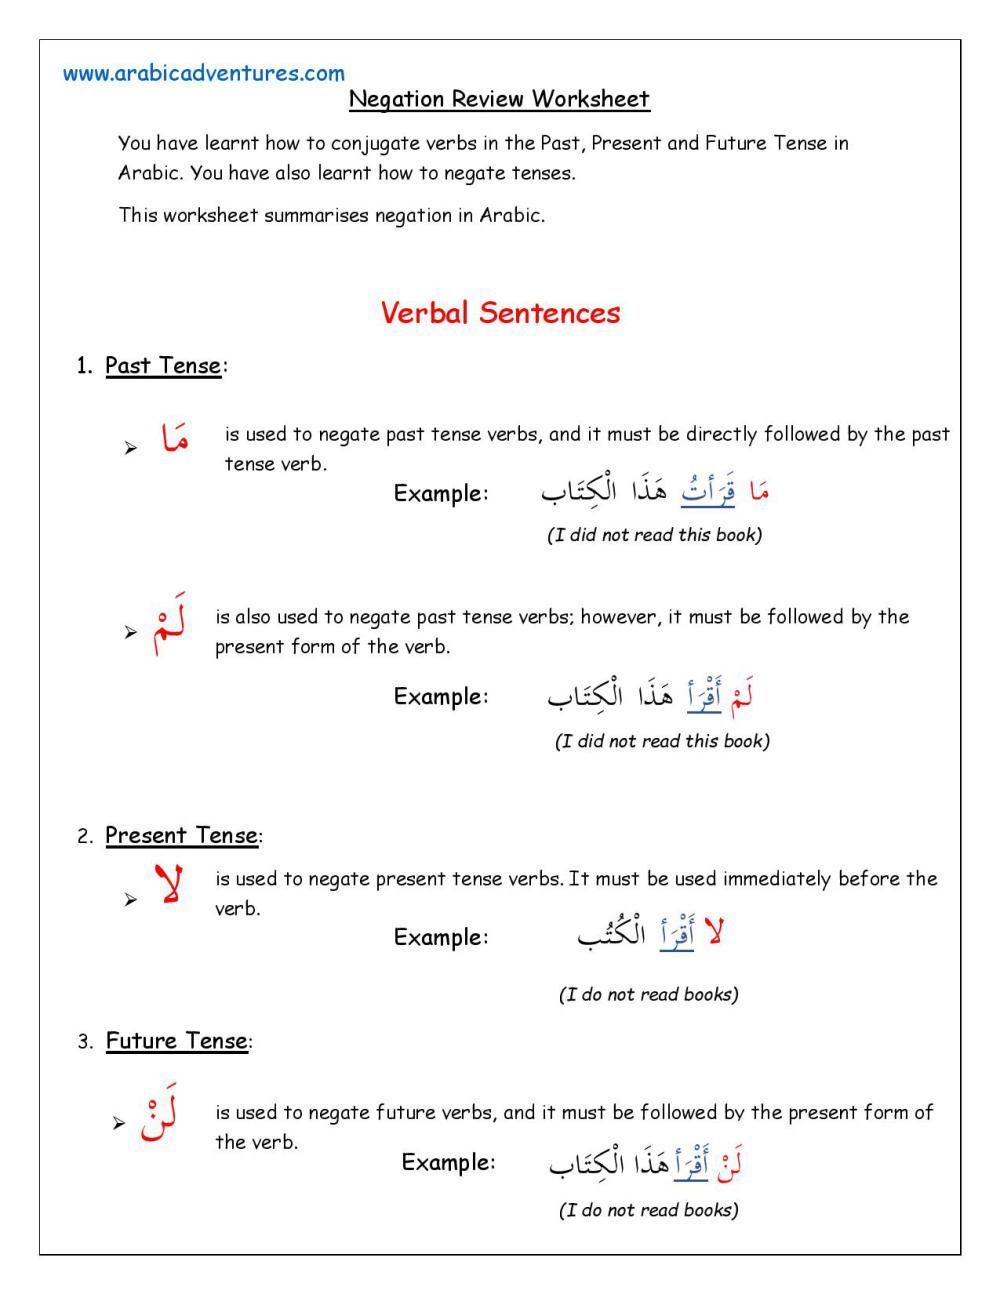 Negation Review Worksheet-page-001   Learn arabic online [ 1294 x 1000 Pixel ]